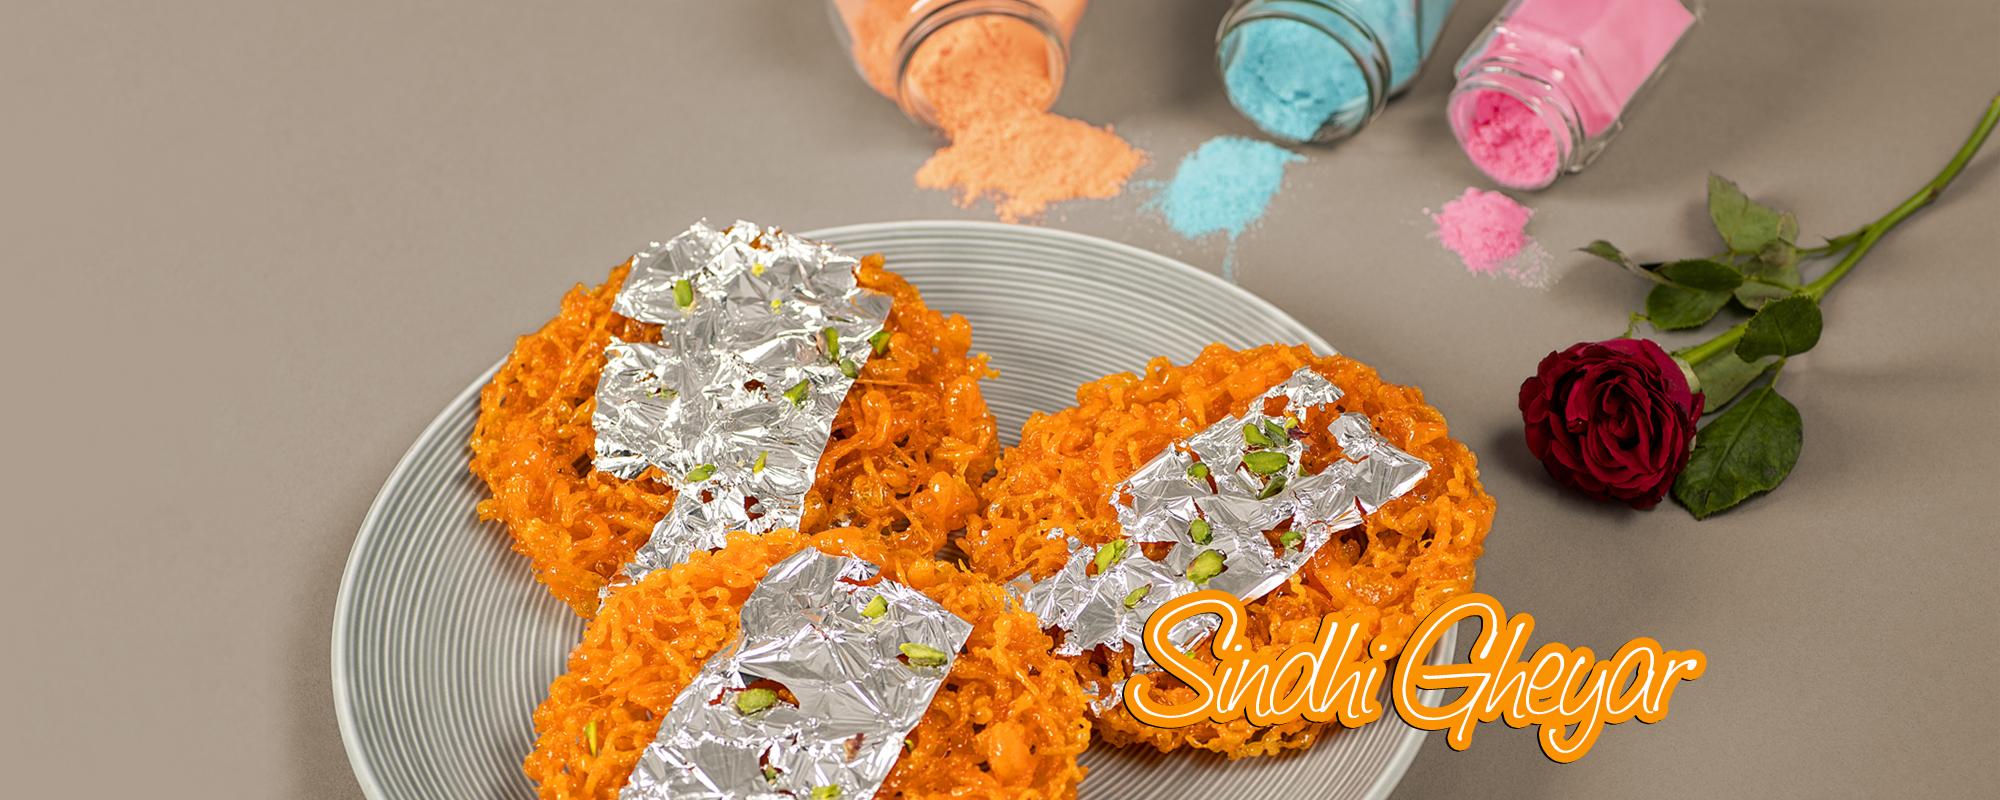 Buy Ghee Sweets in Surat, India